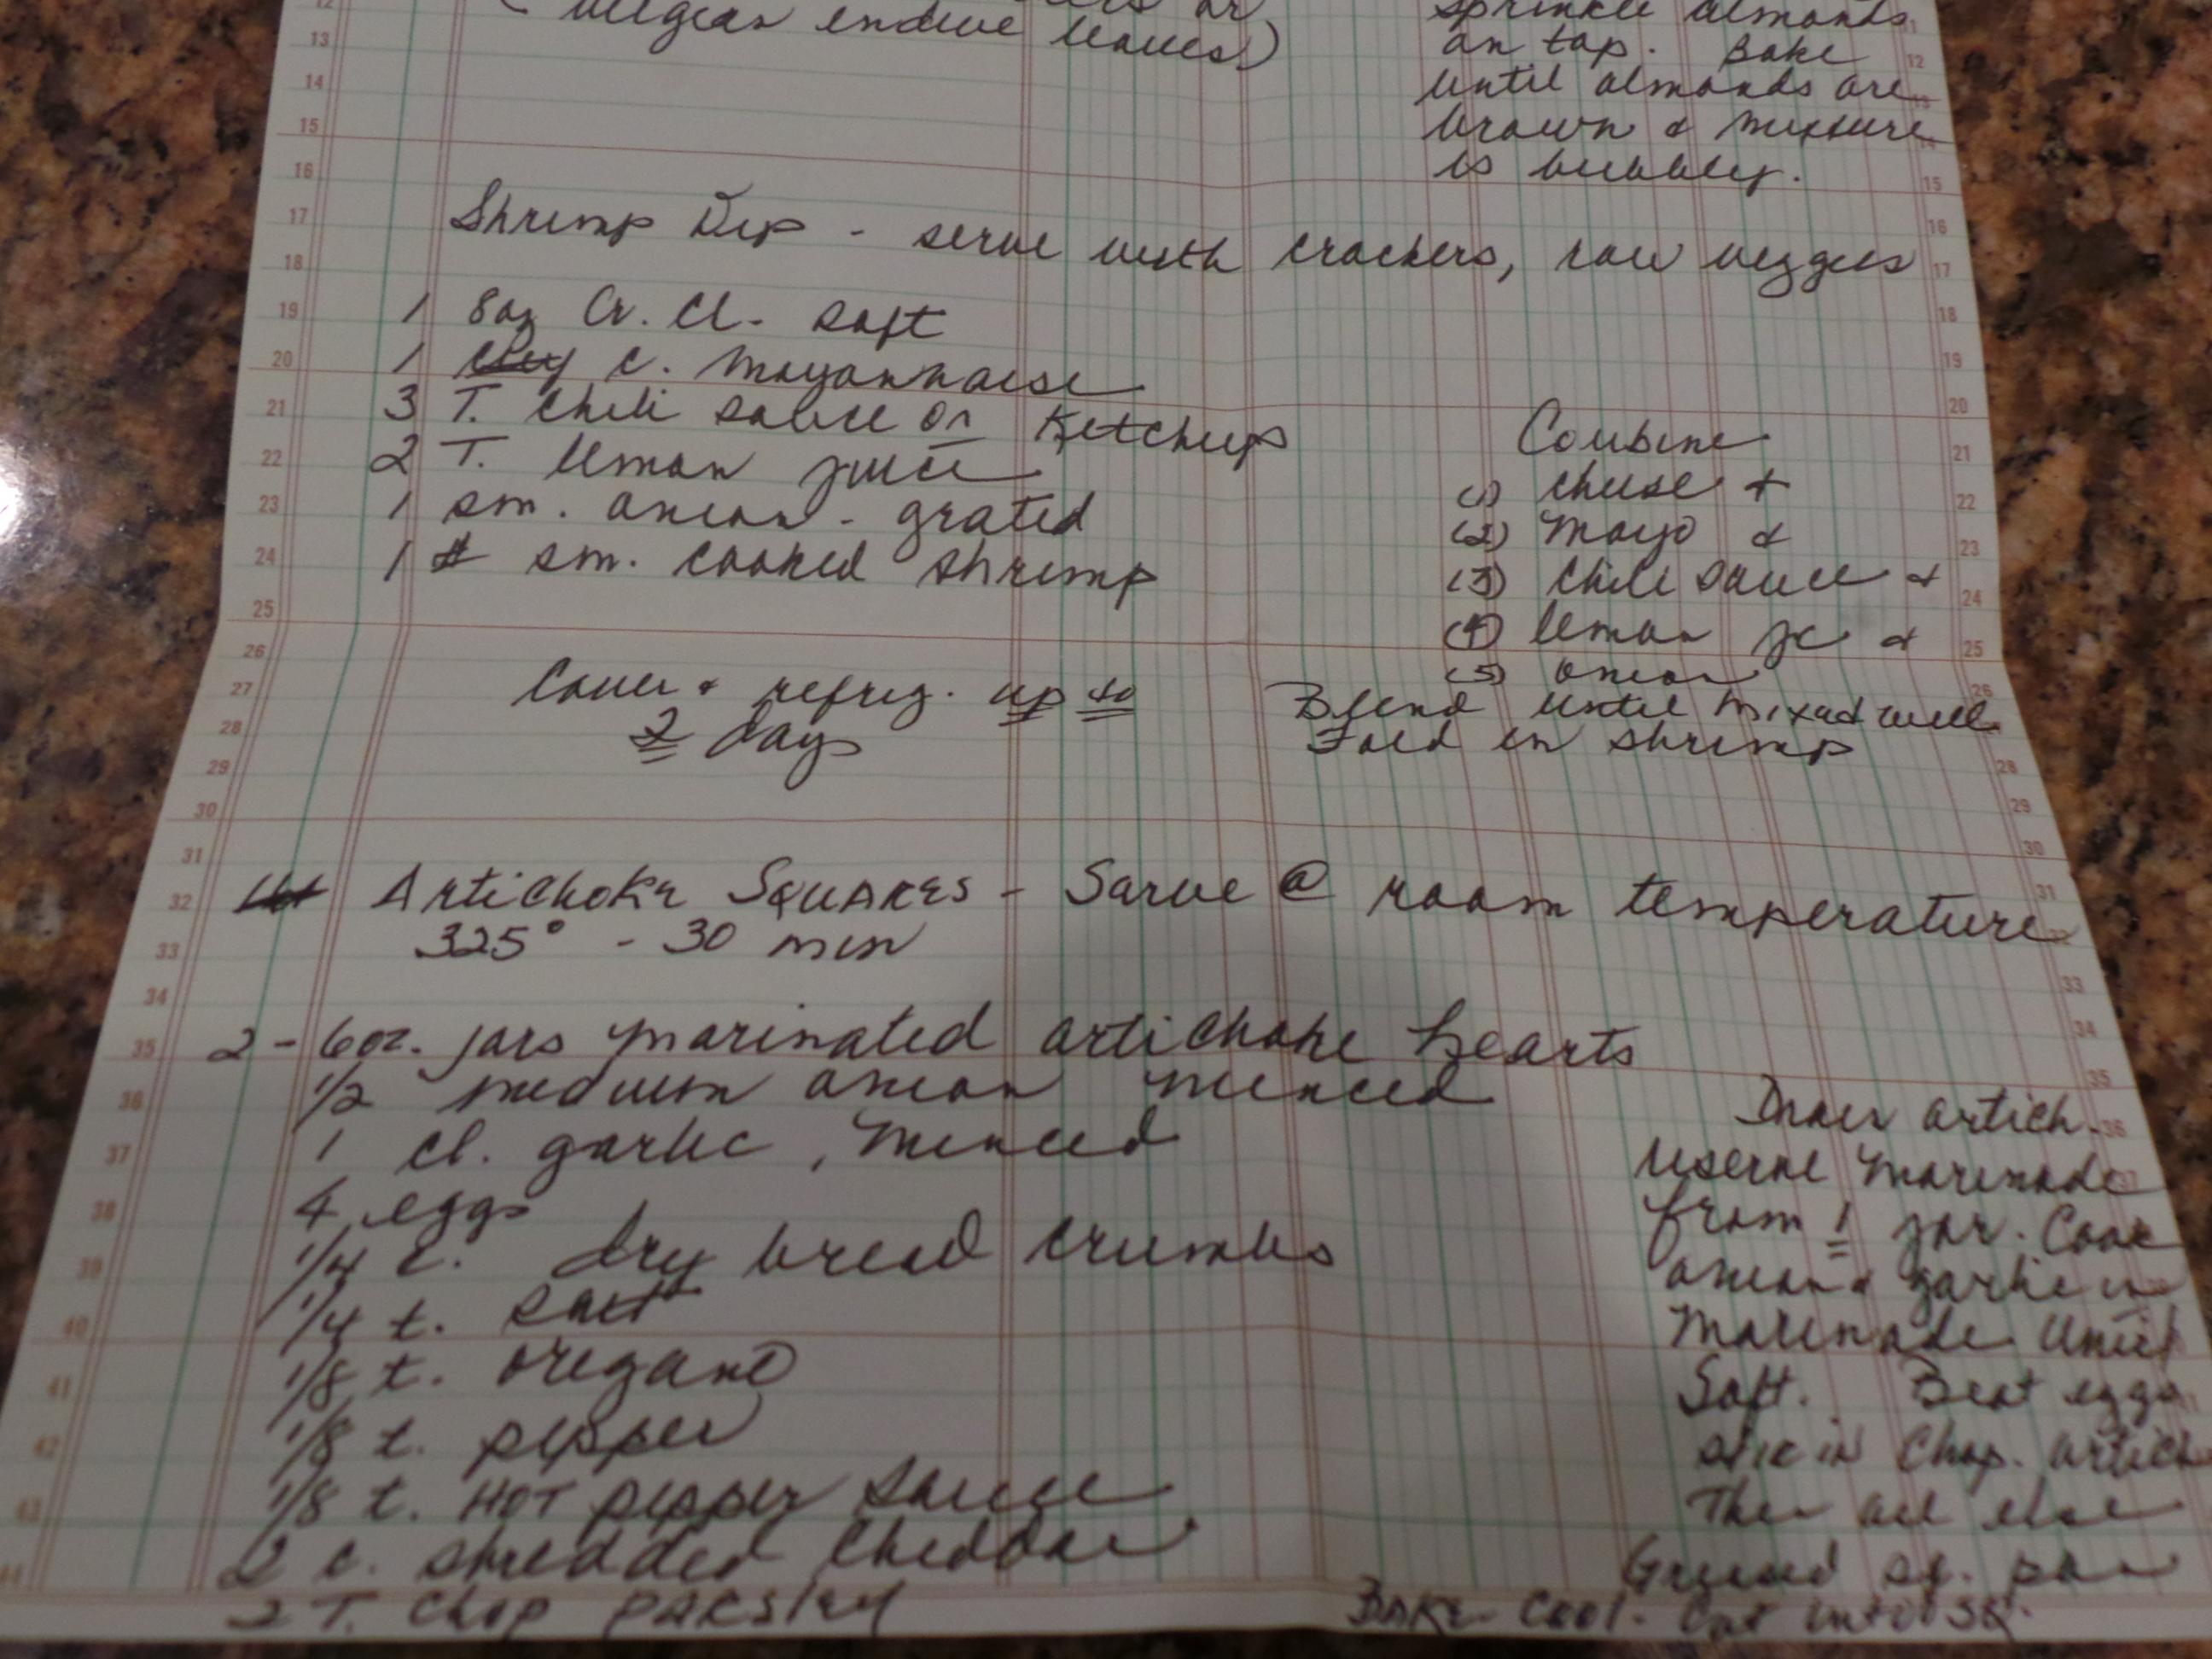 artichoke recipe